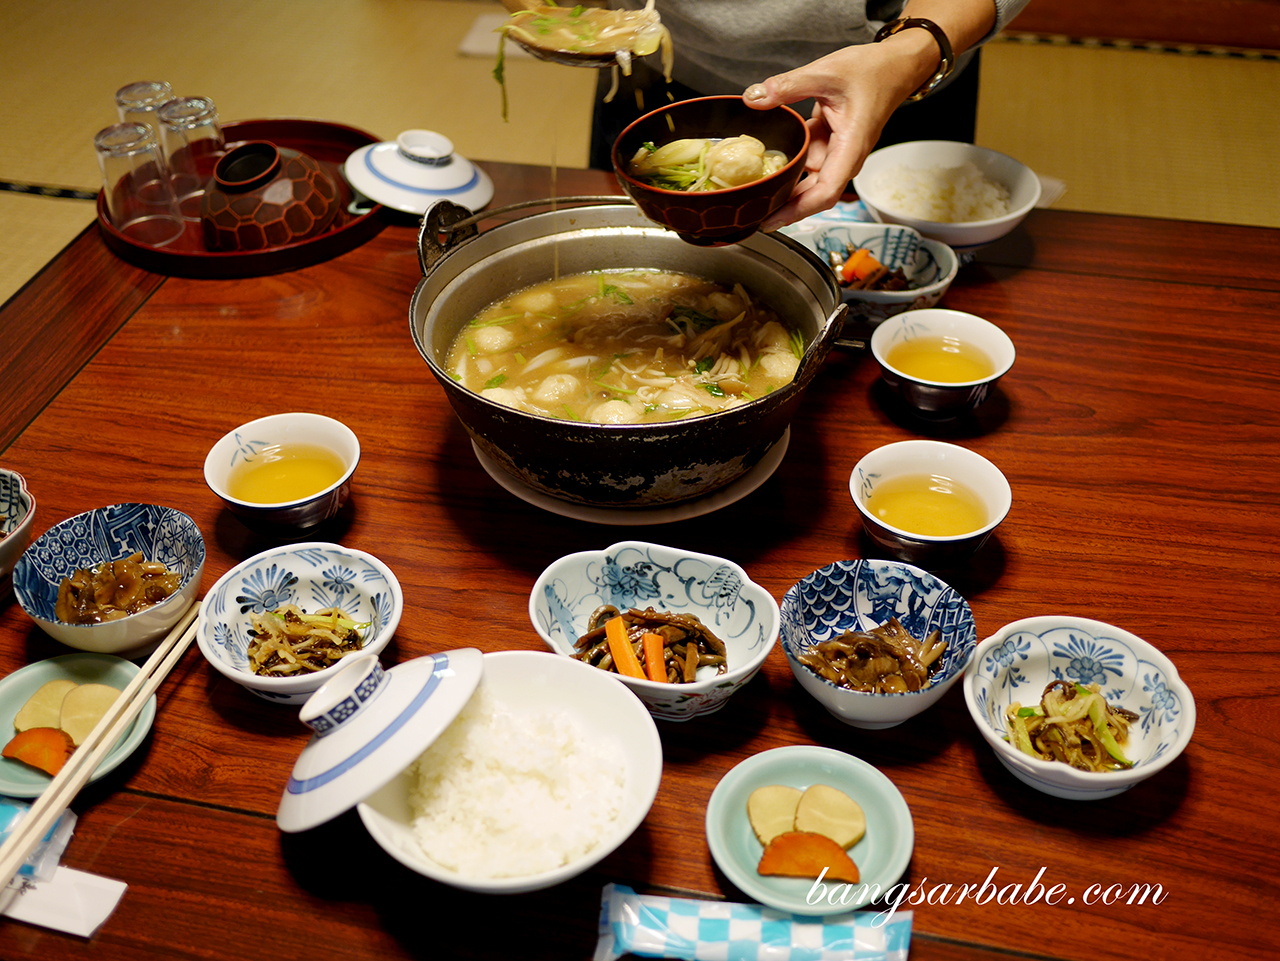 Lunch at Tsurunoyu onsen